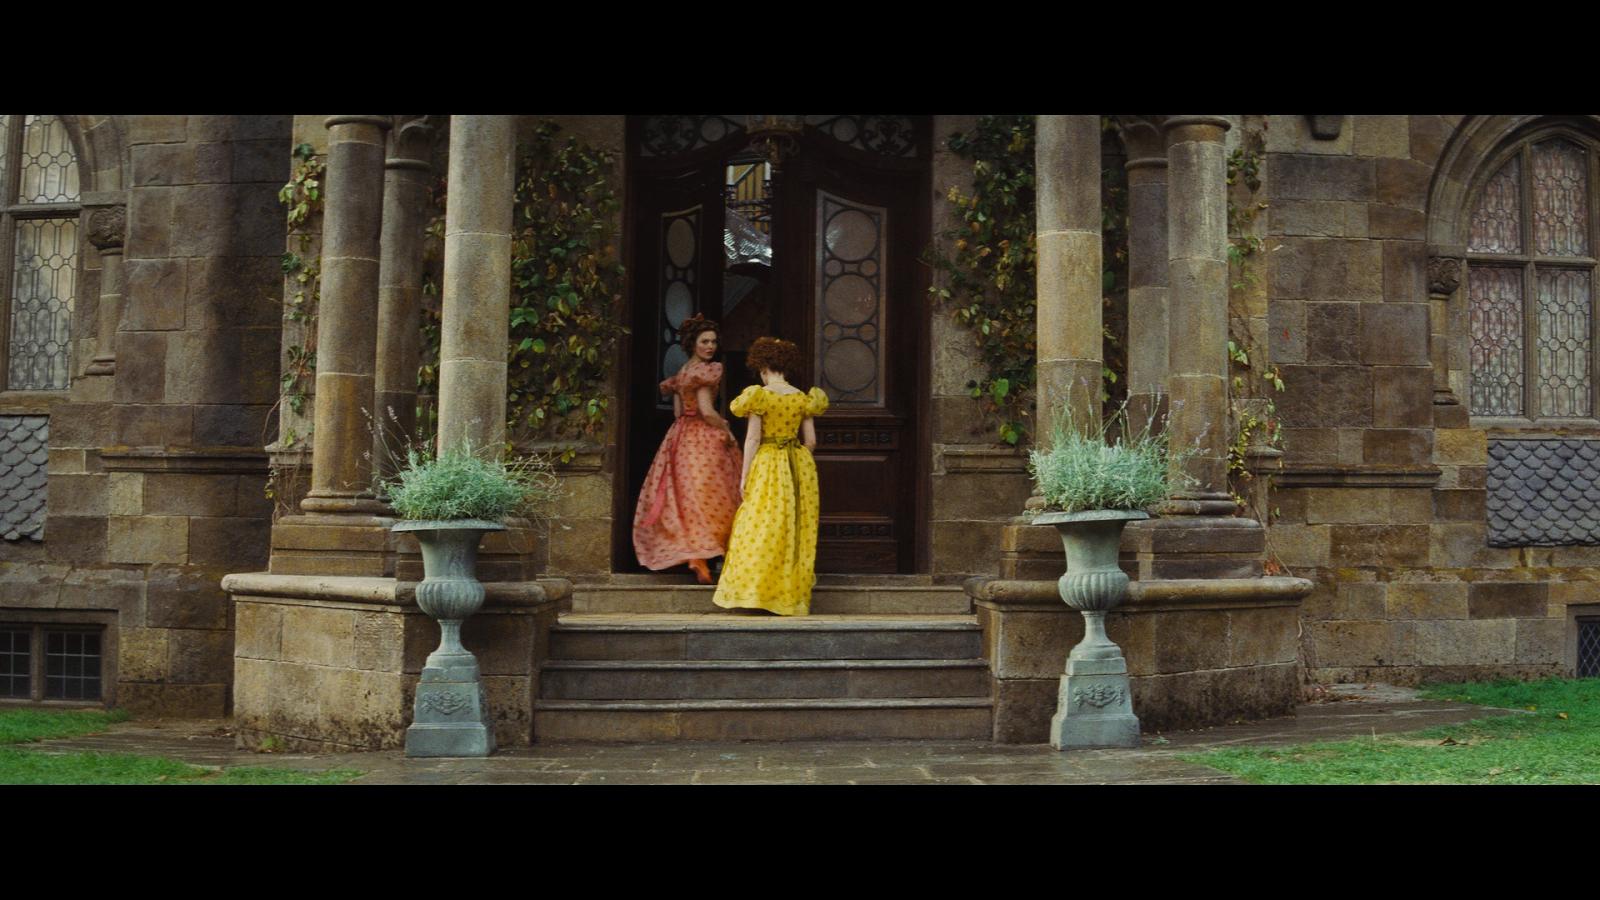 Cenicienta (2015) 1080p BD25 2